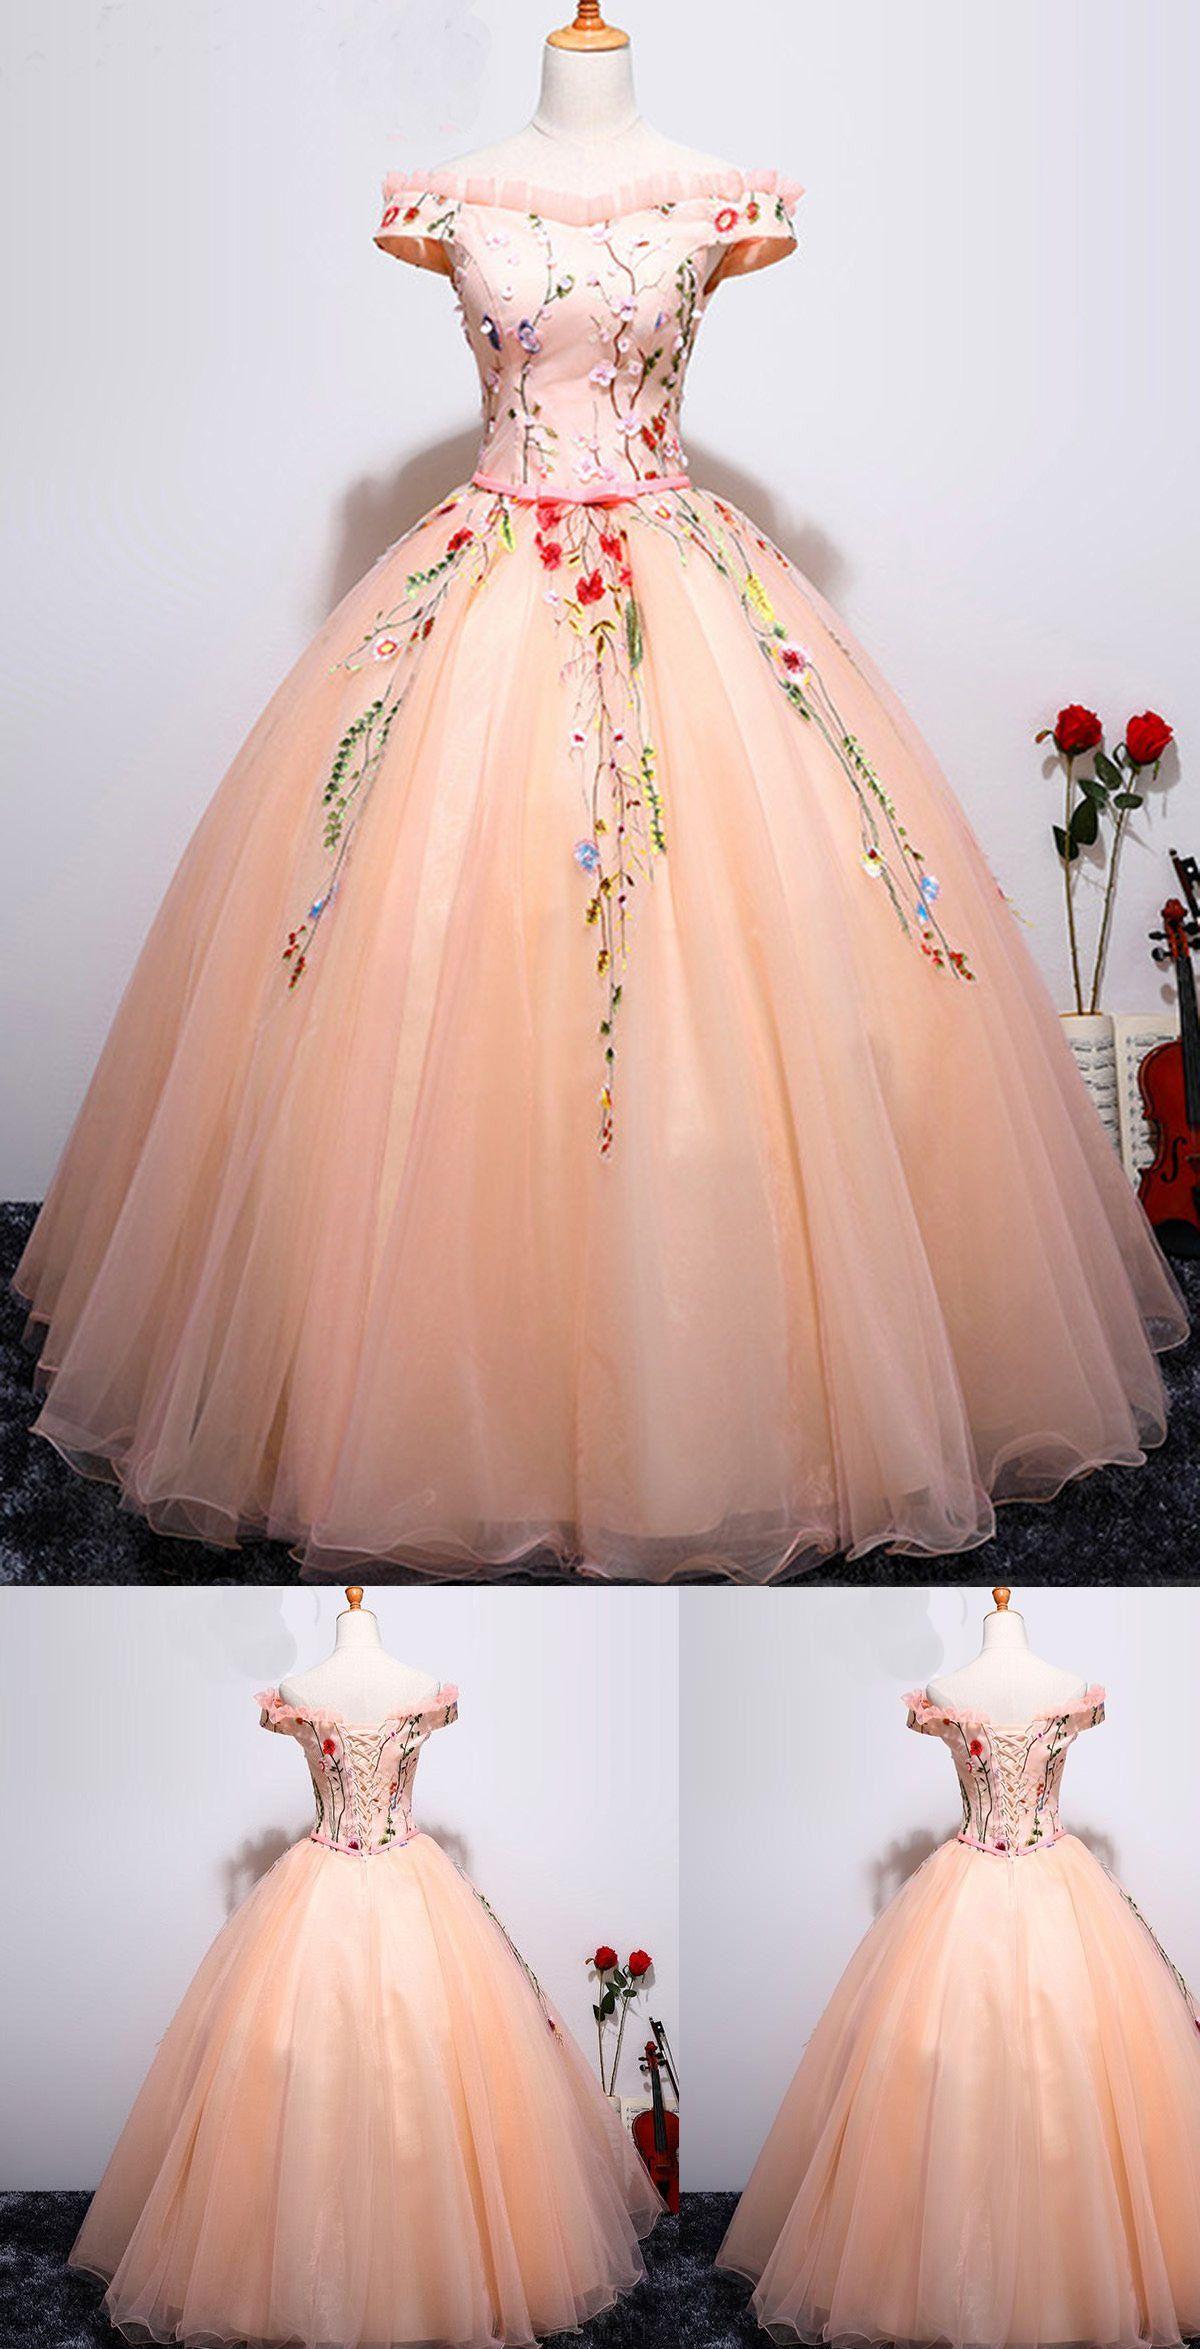 Long prom dresses lace prom dresses pink prom dresses cute prom